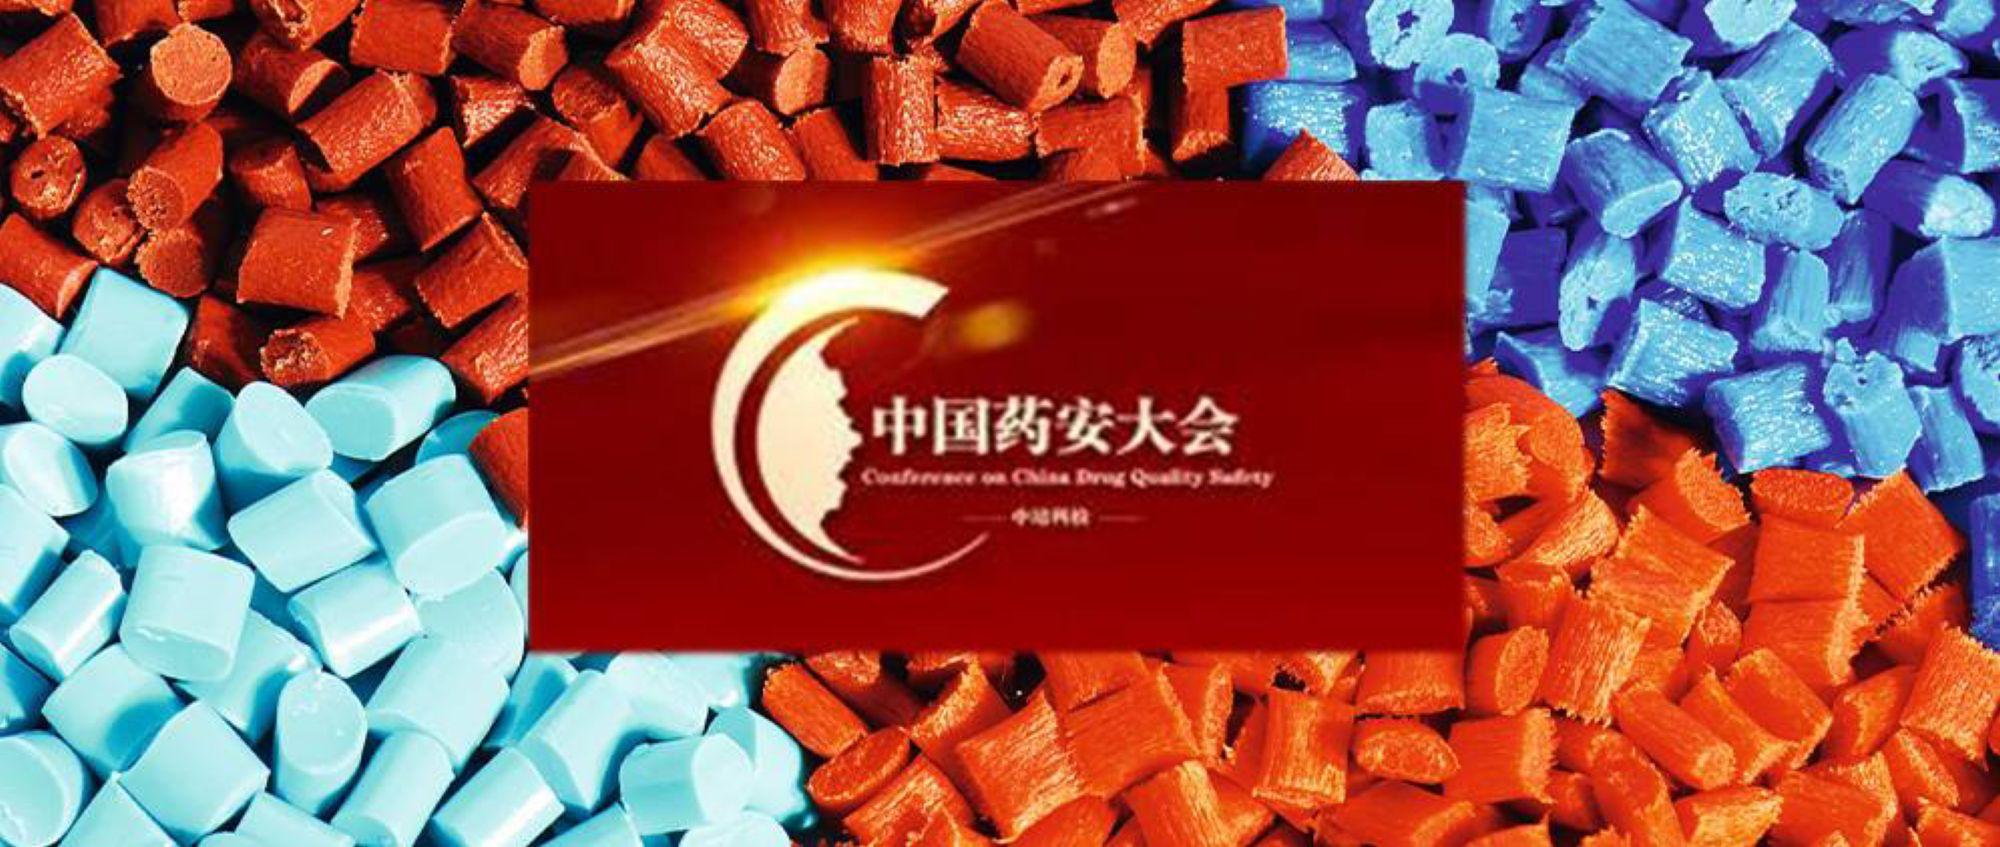 CN_20200803_Pharma_SZ_Quality_Safety-996x442.jpg